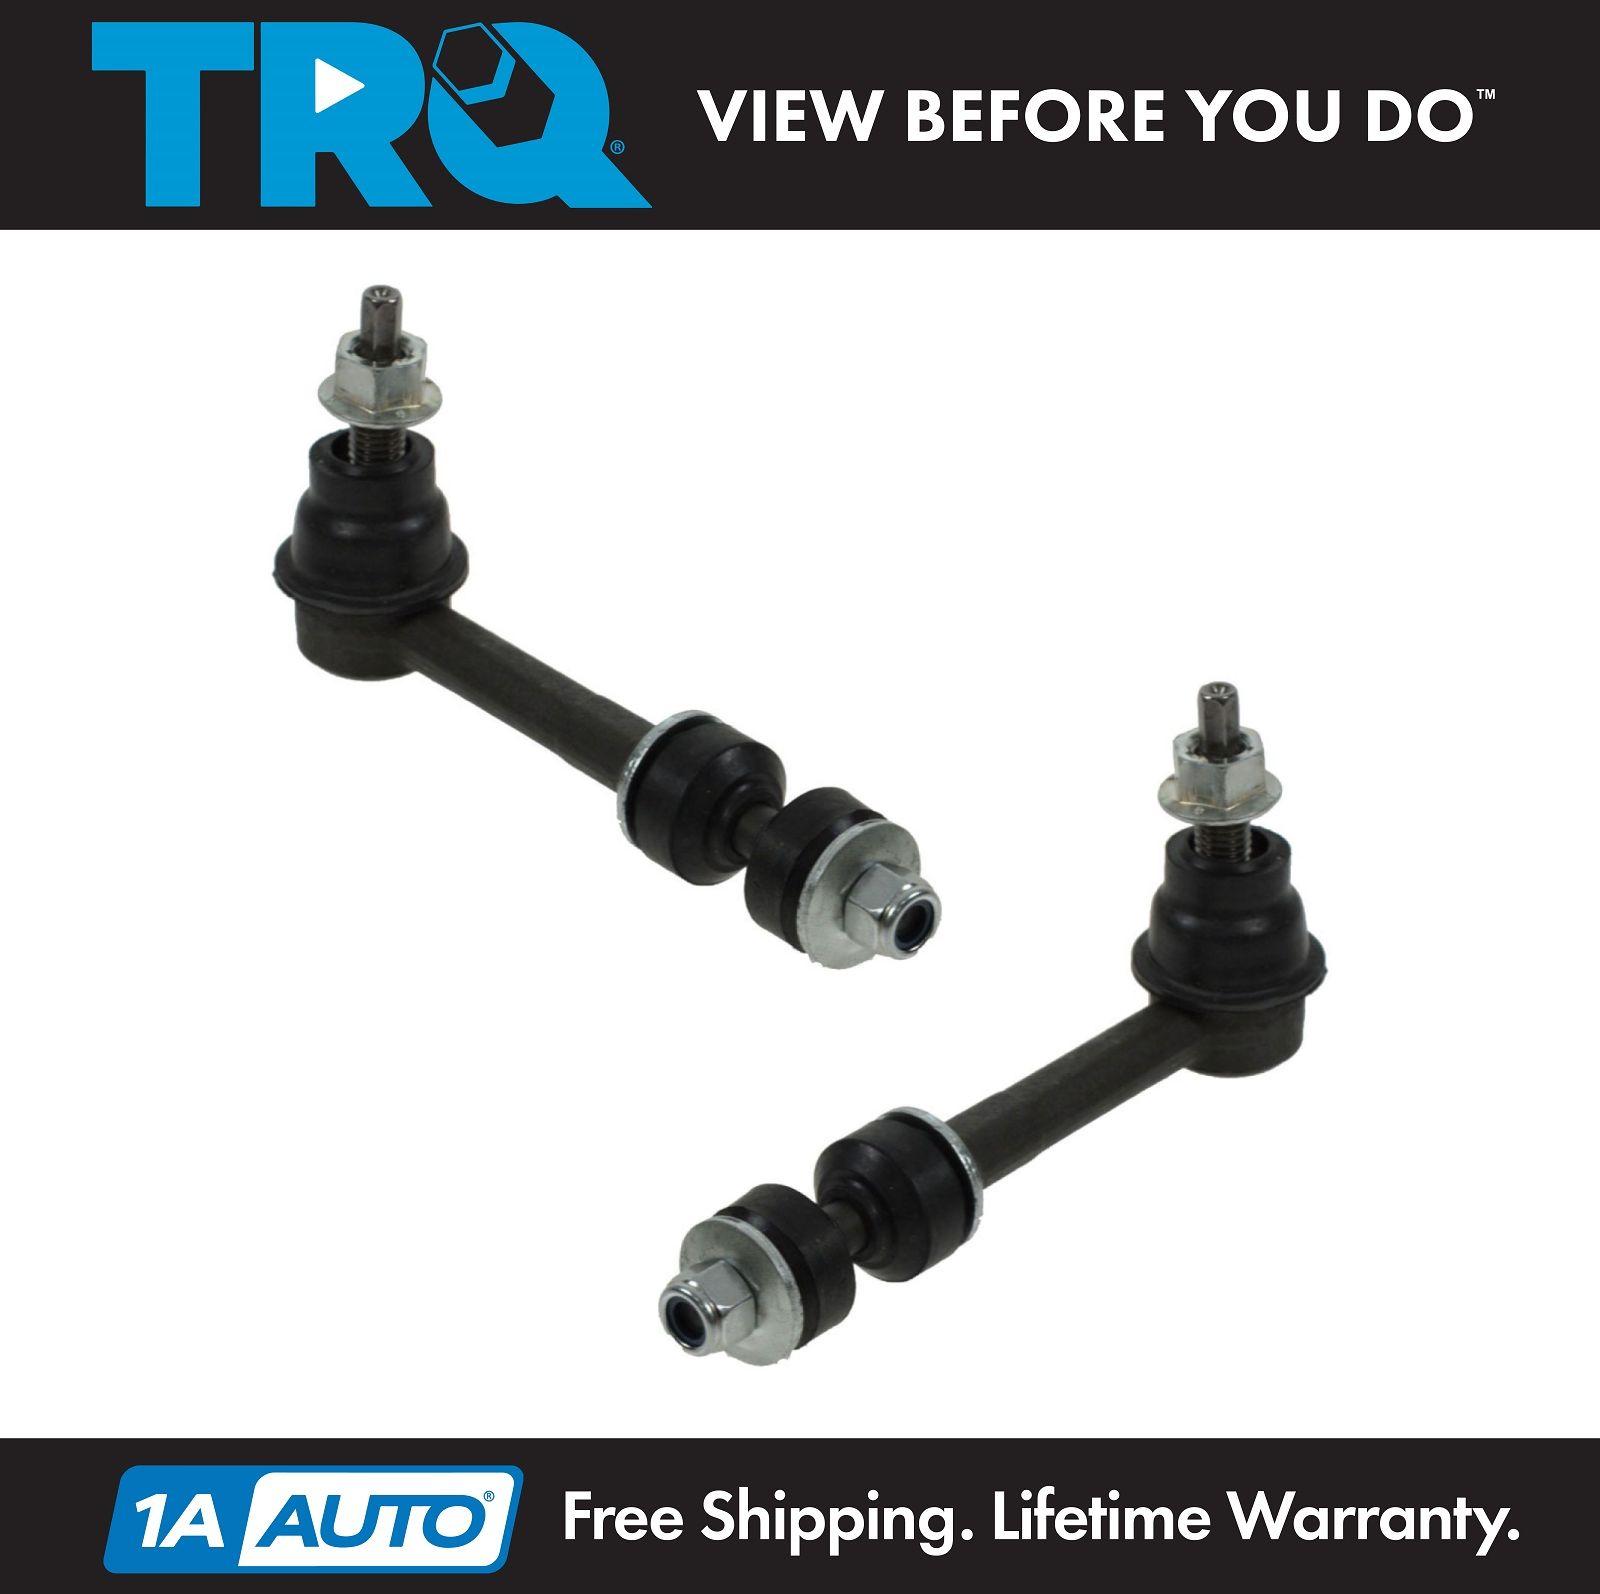 Pair Suspension Stabilizer Bar Link for Dodge Ram 1500 2500 3500 Kit 4WD